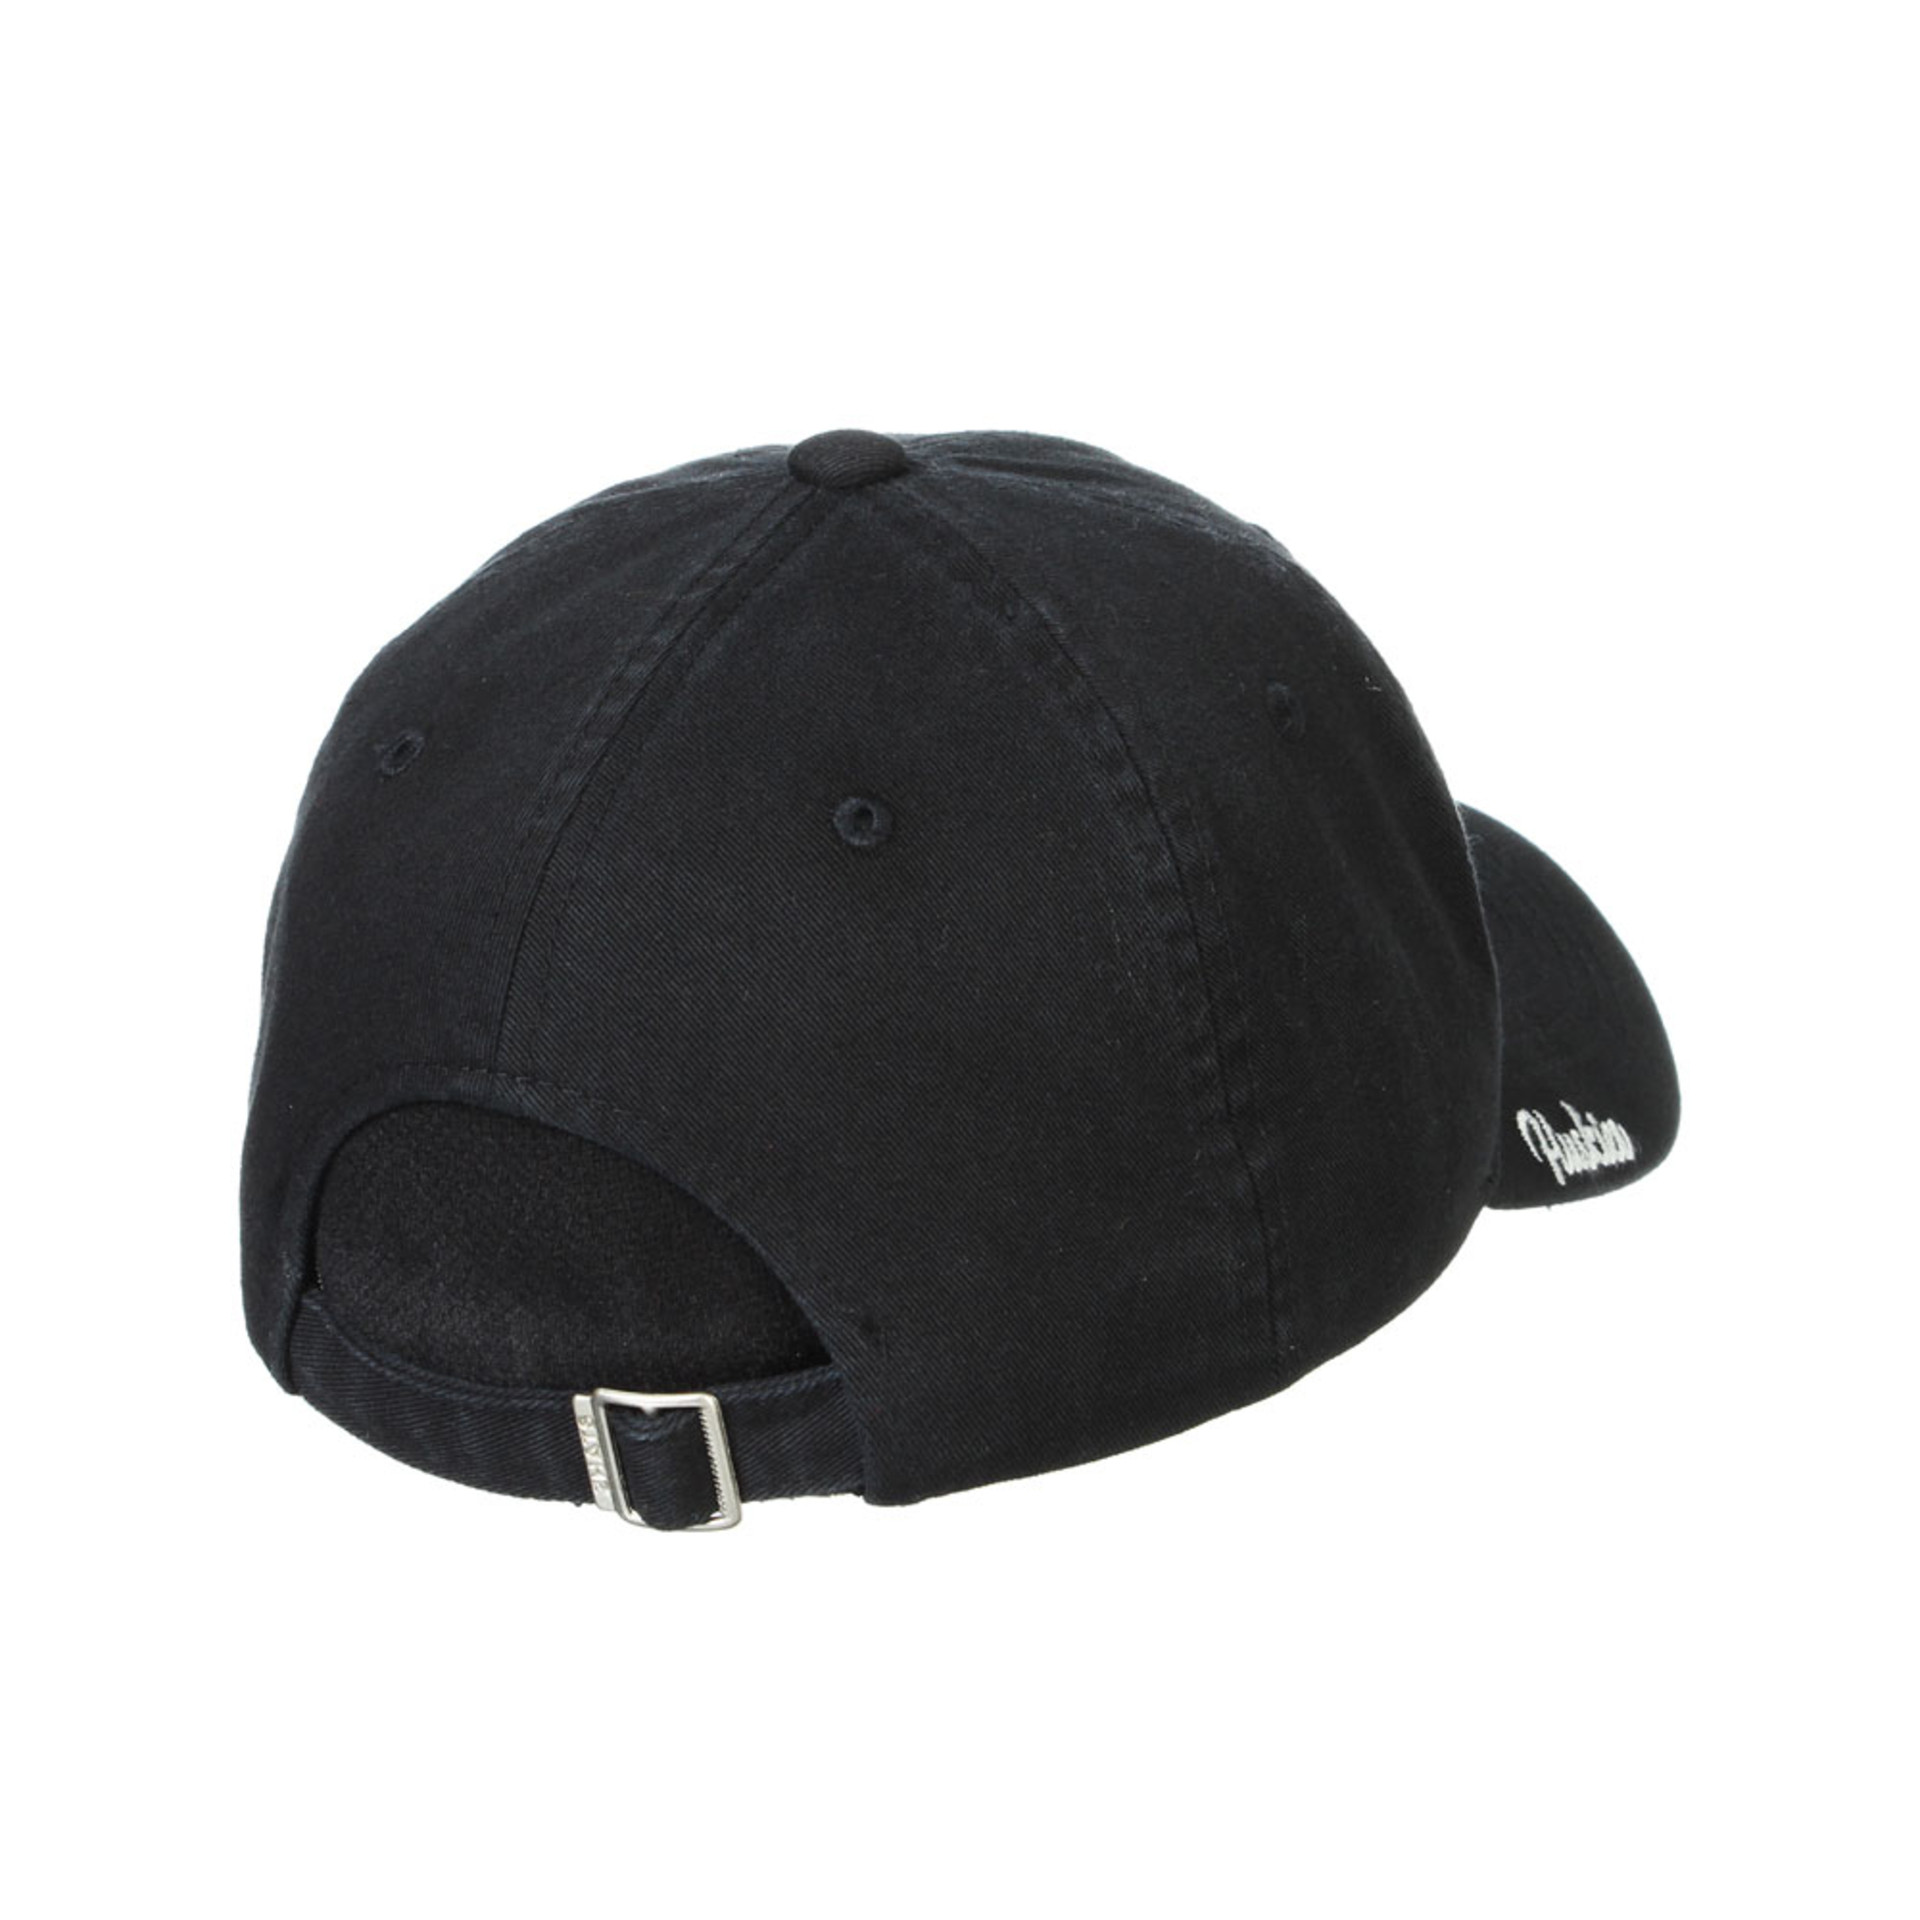 Zephyr Women's Black W Pepper Adjustable Hat – Back